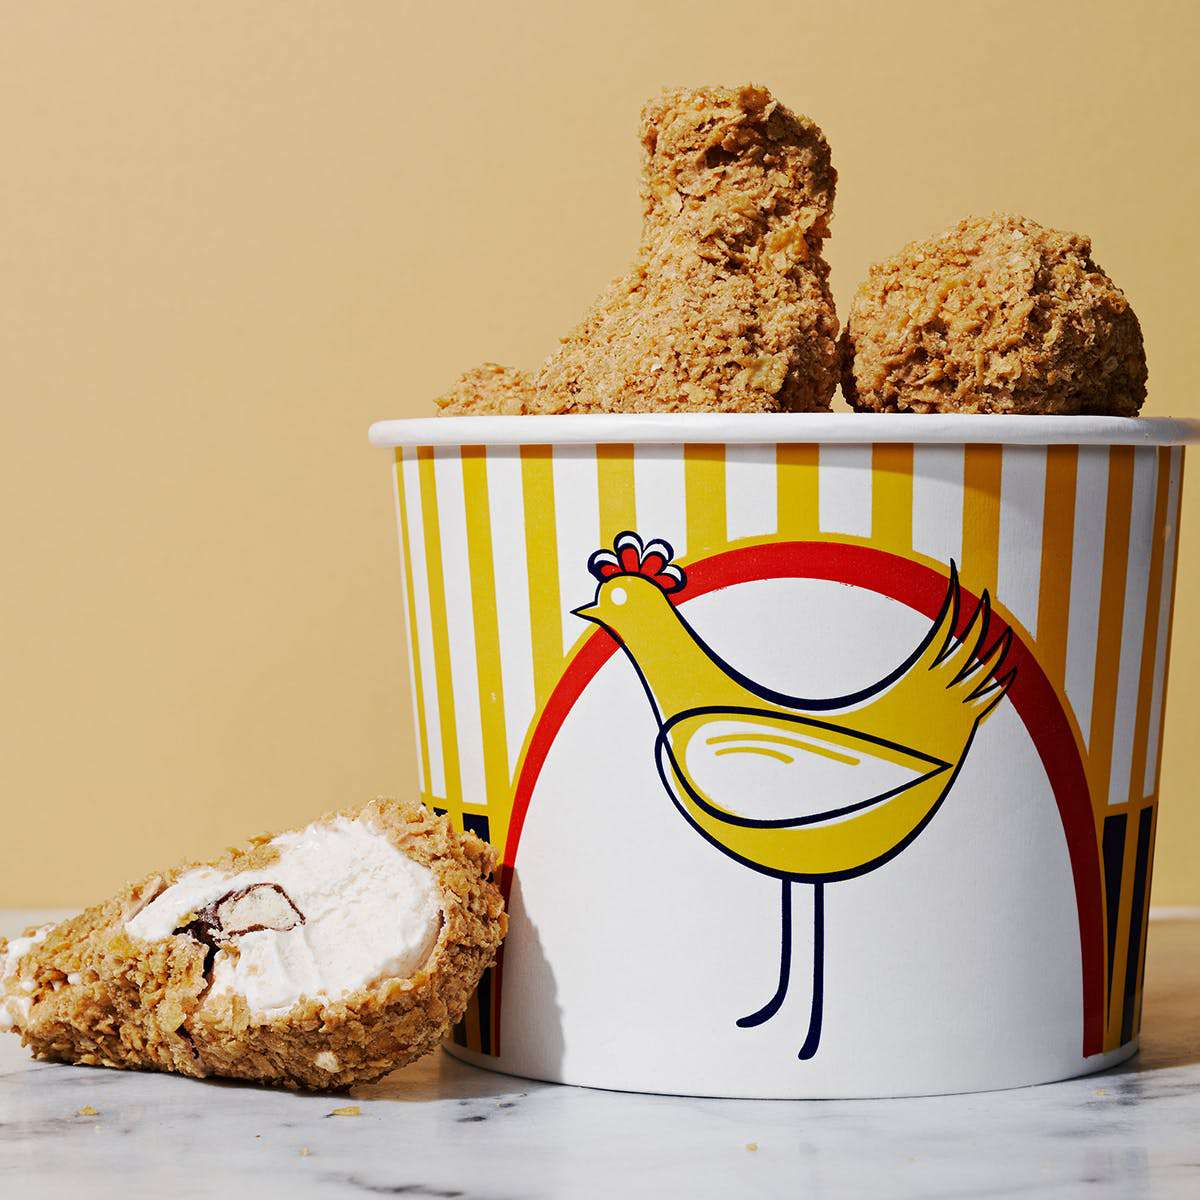 life-raft-treats-fried-chicken-ice-cream